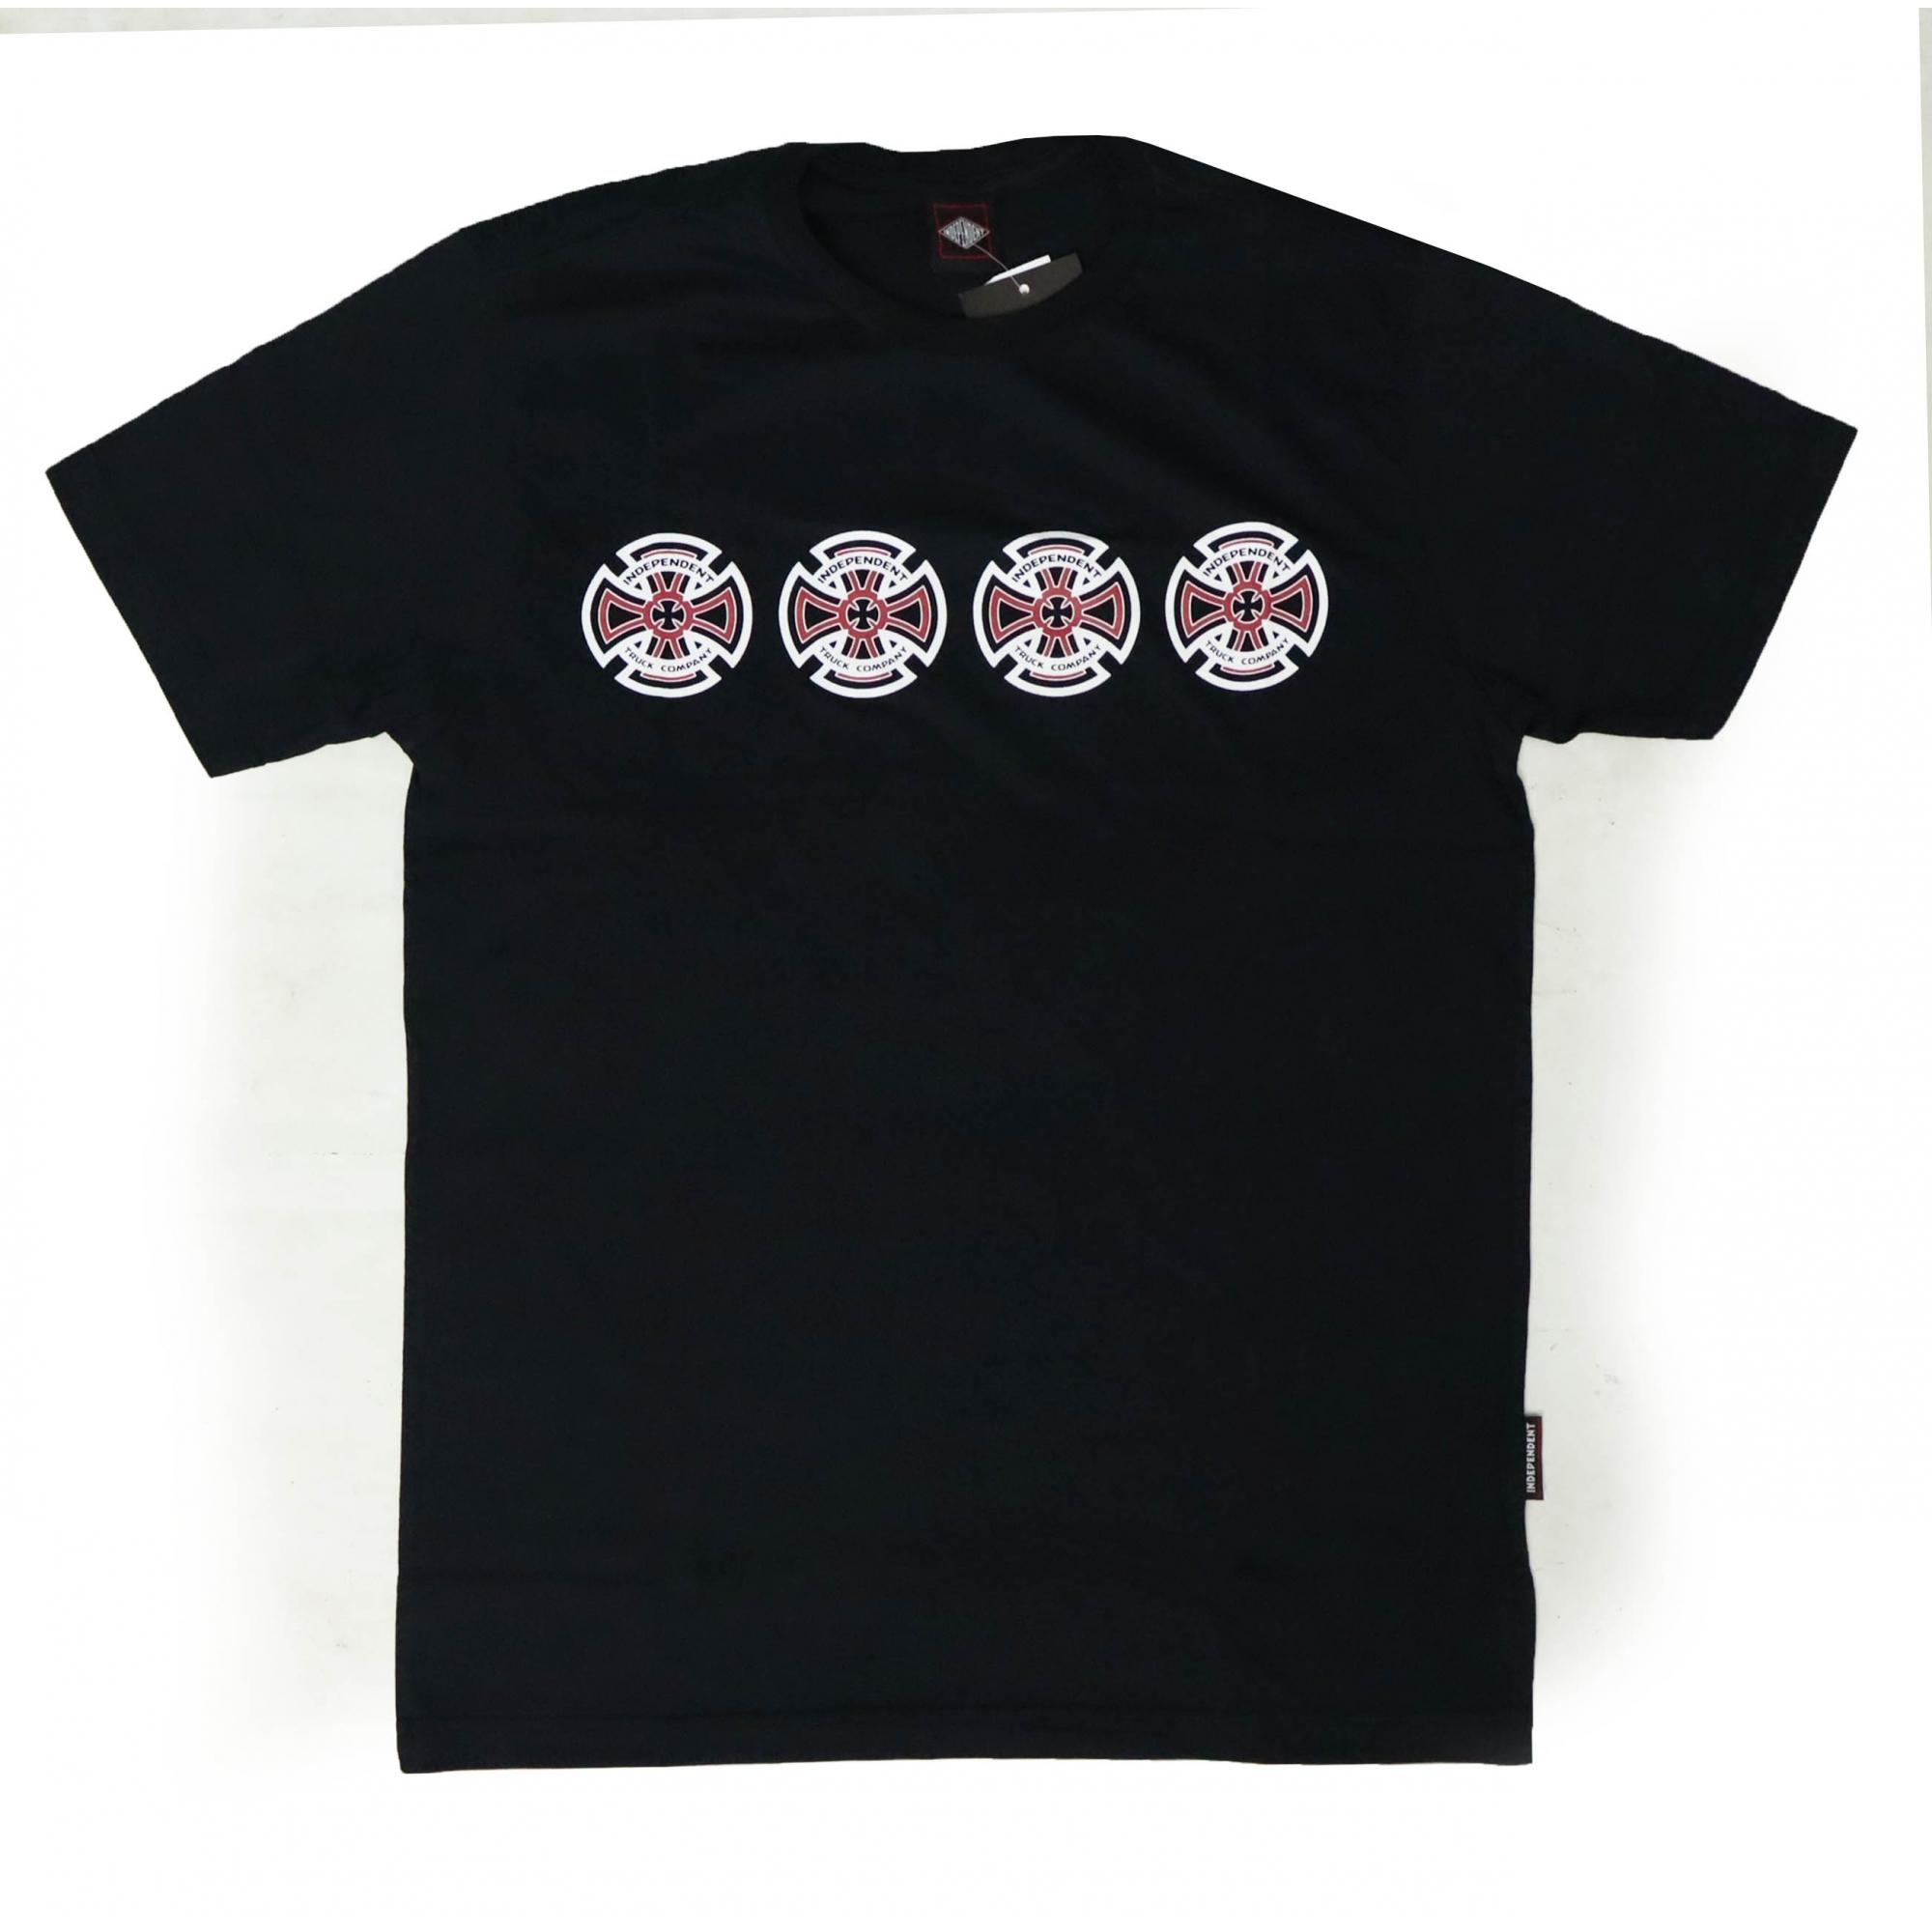 Camiseta Independent Valient - Preto